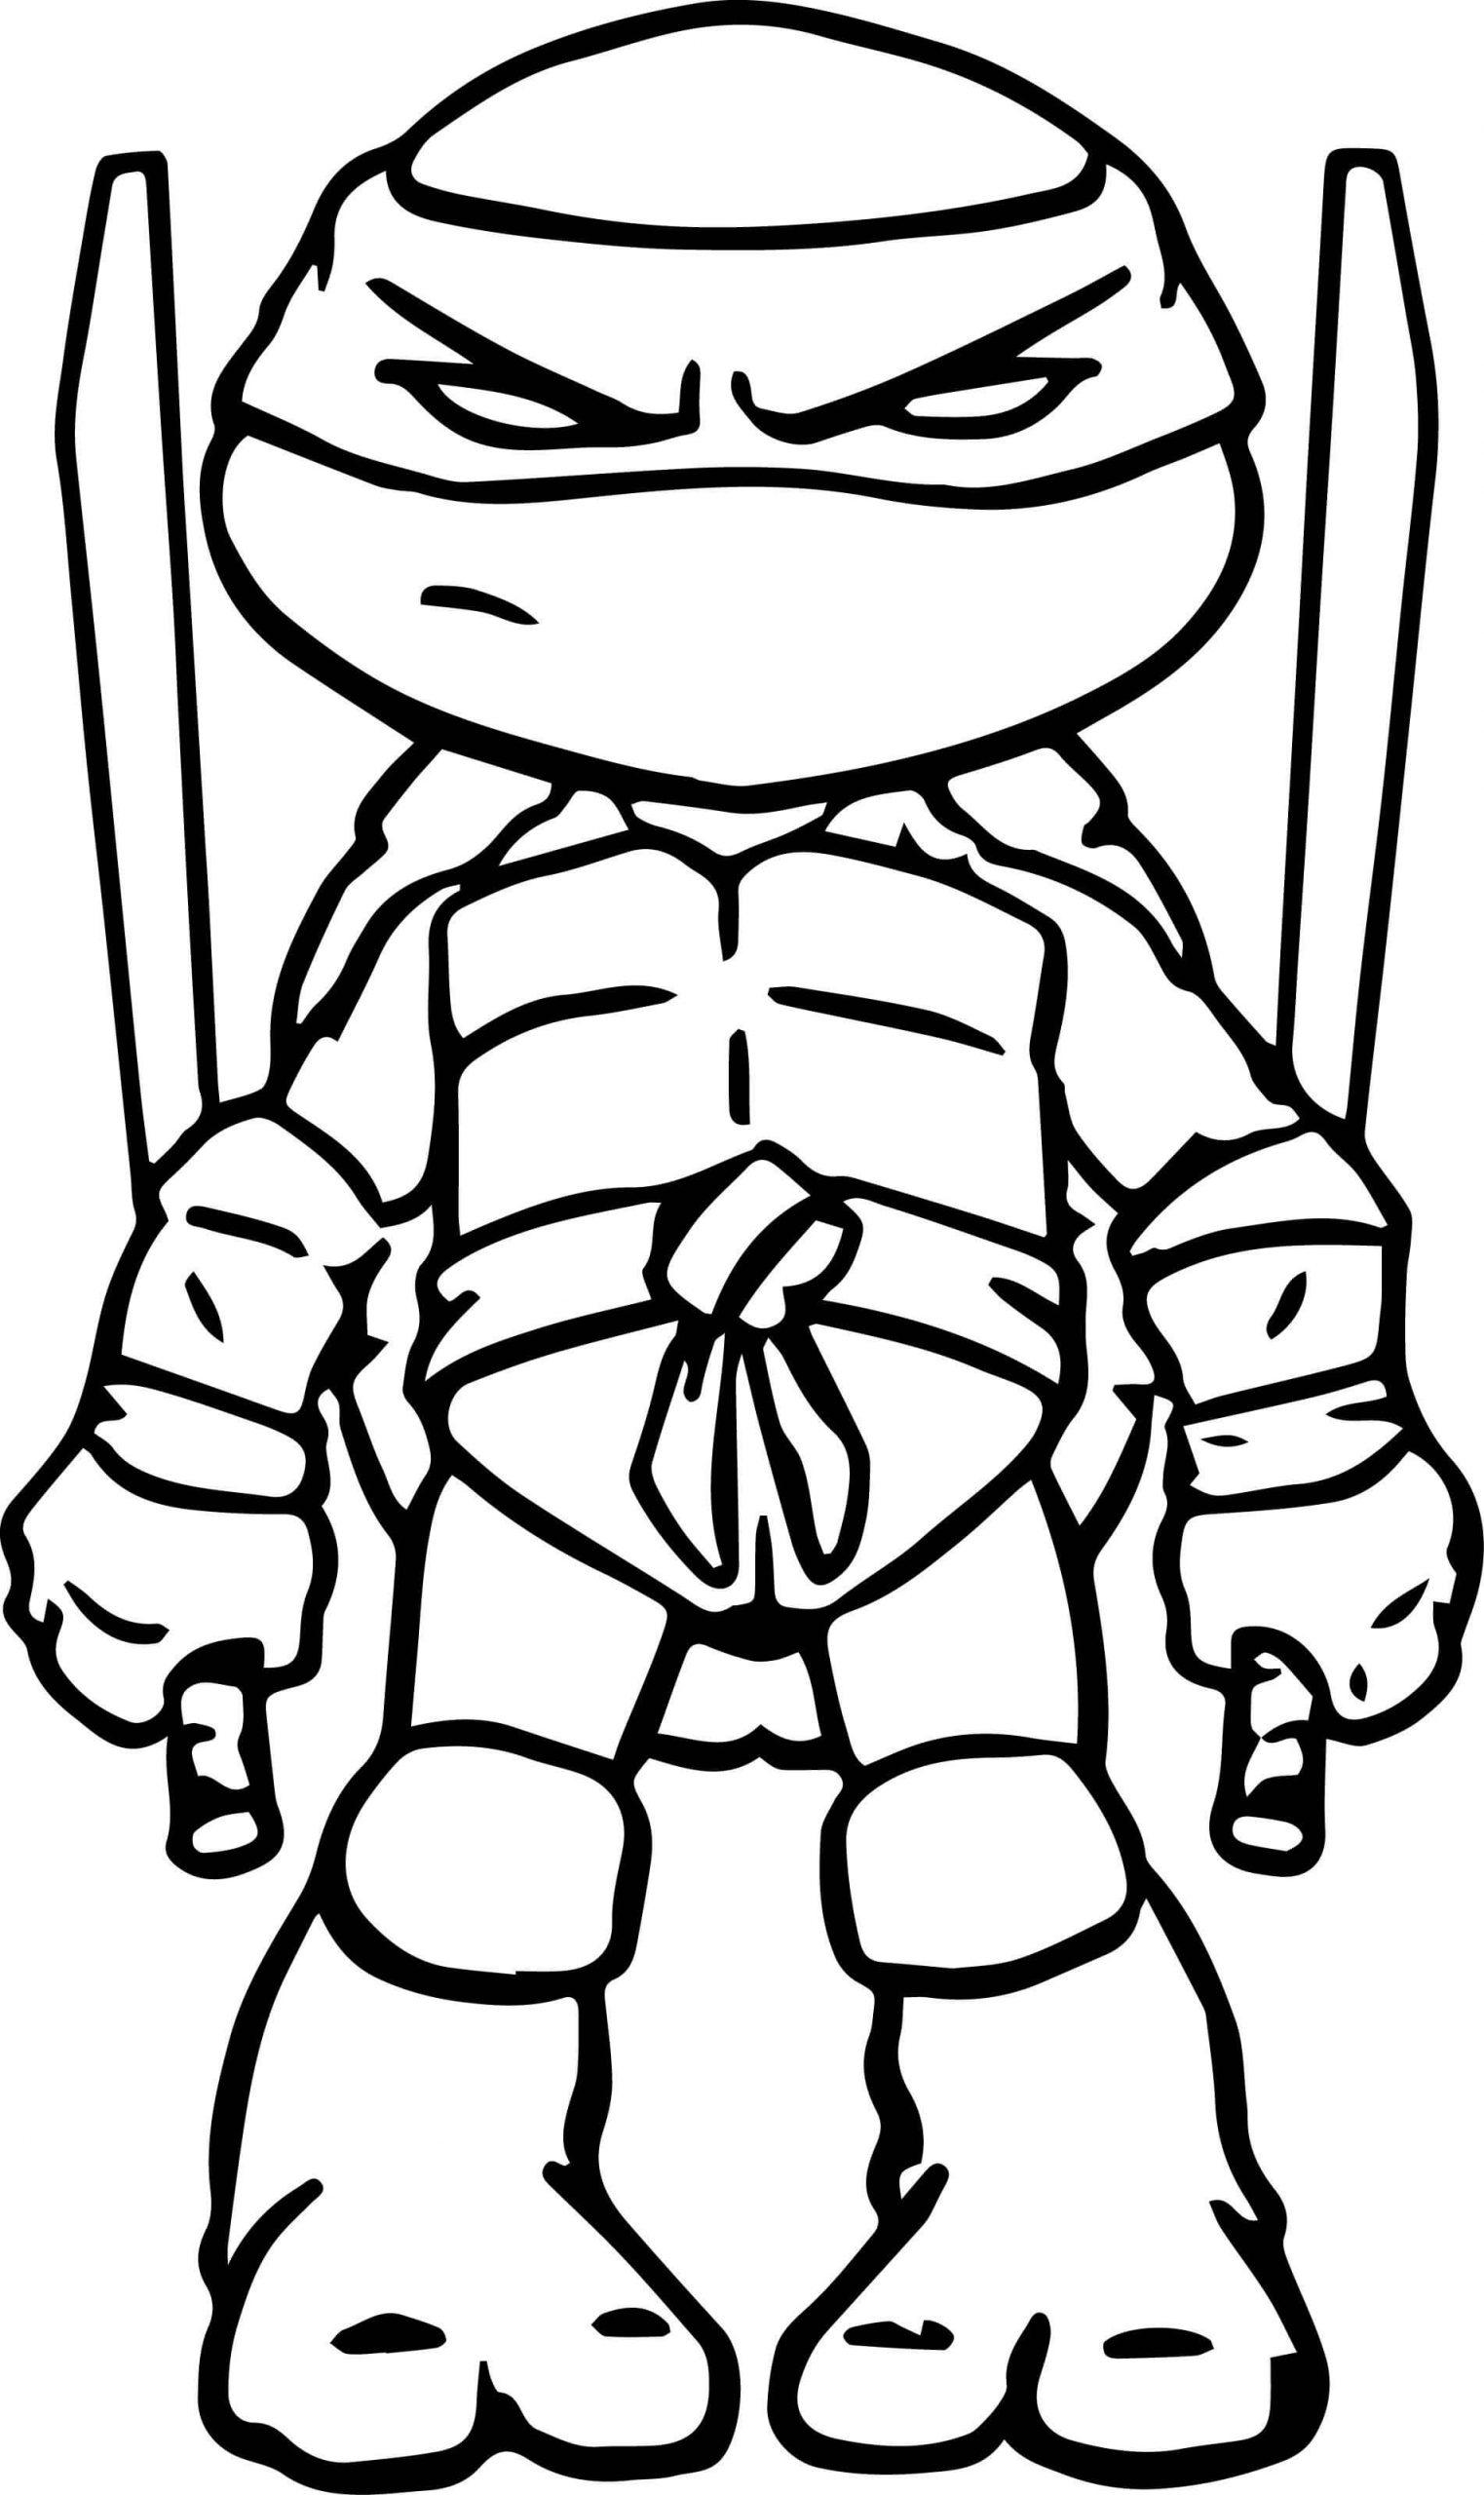 Desenhos de Tartarugas Ninja Zangadas para colorir